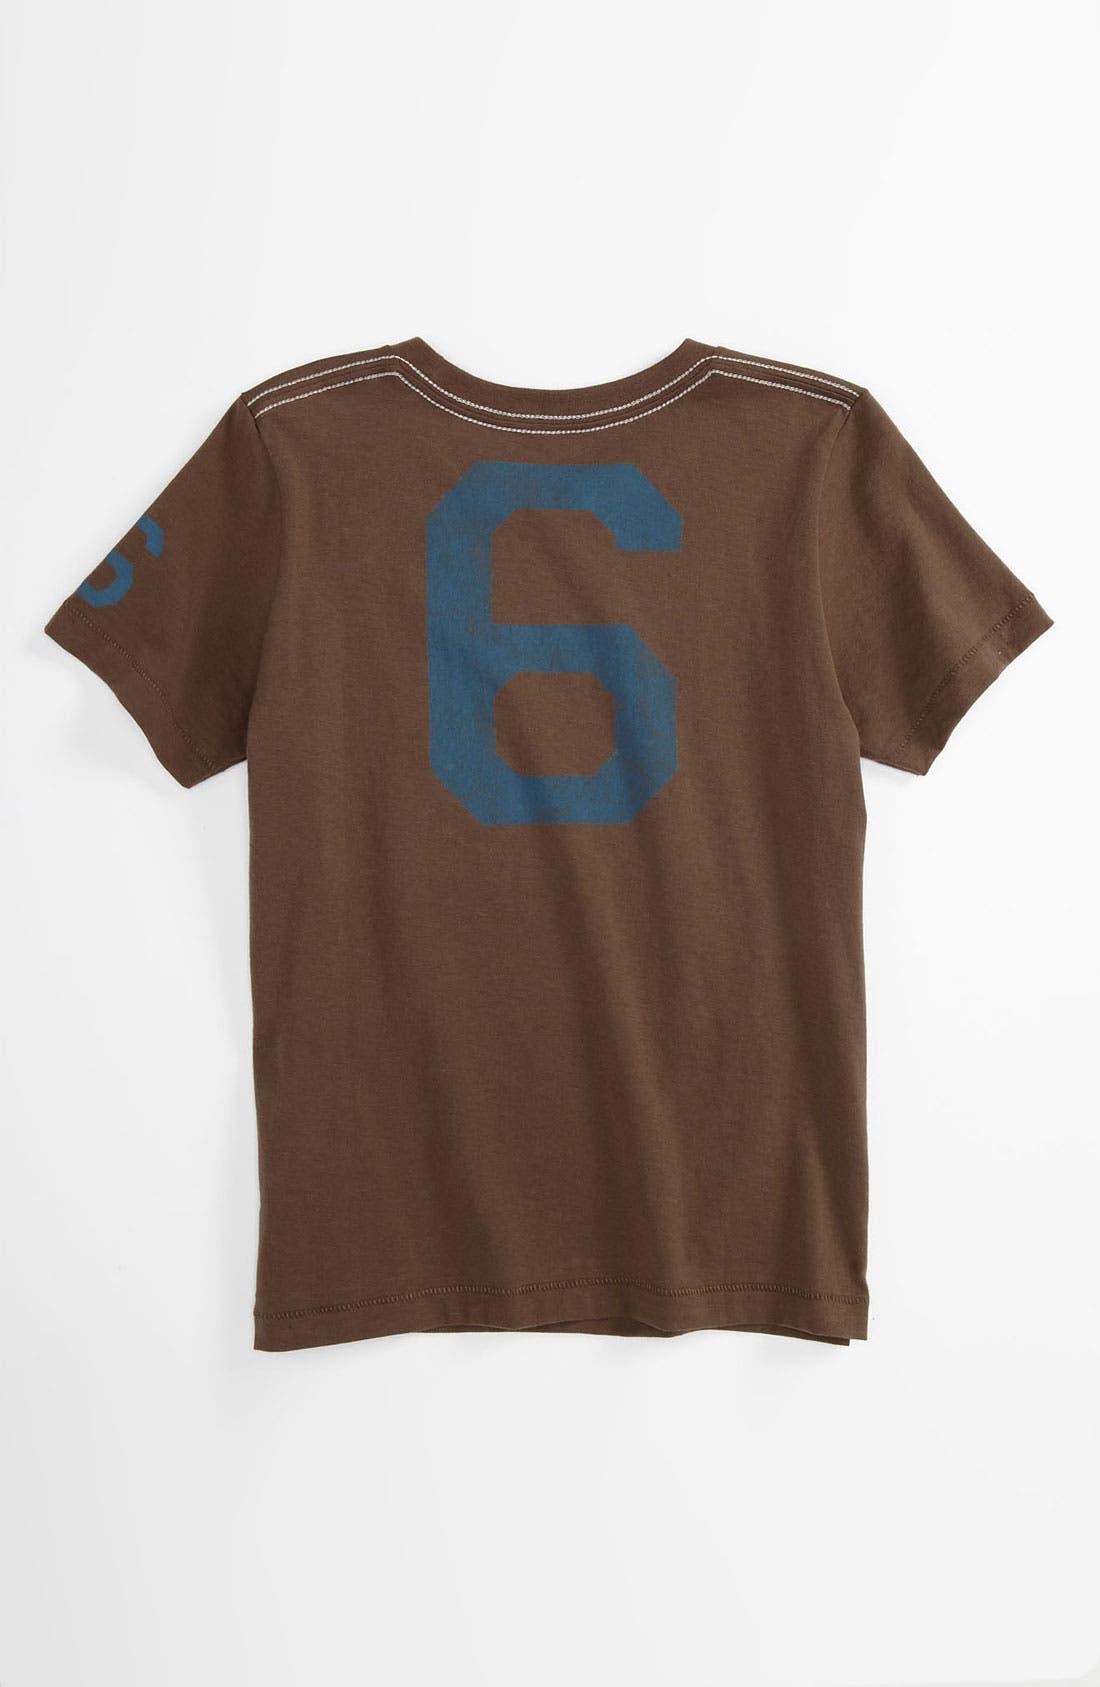 Alternate Image 2  - Peek 'Shortstop' T-Shirt (Toddler, Little Boys & Big Boys)